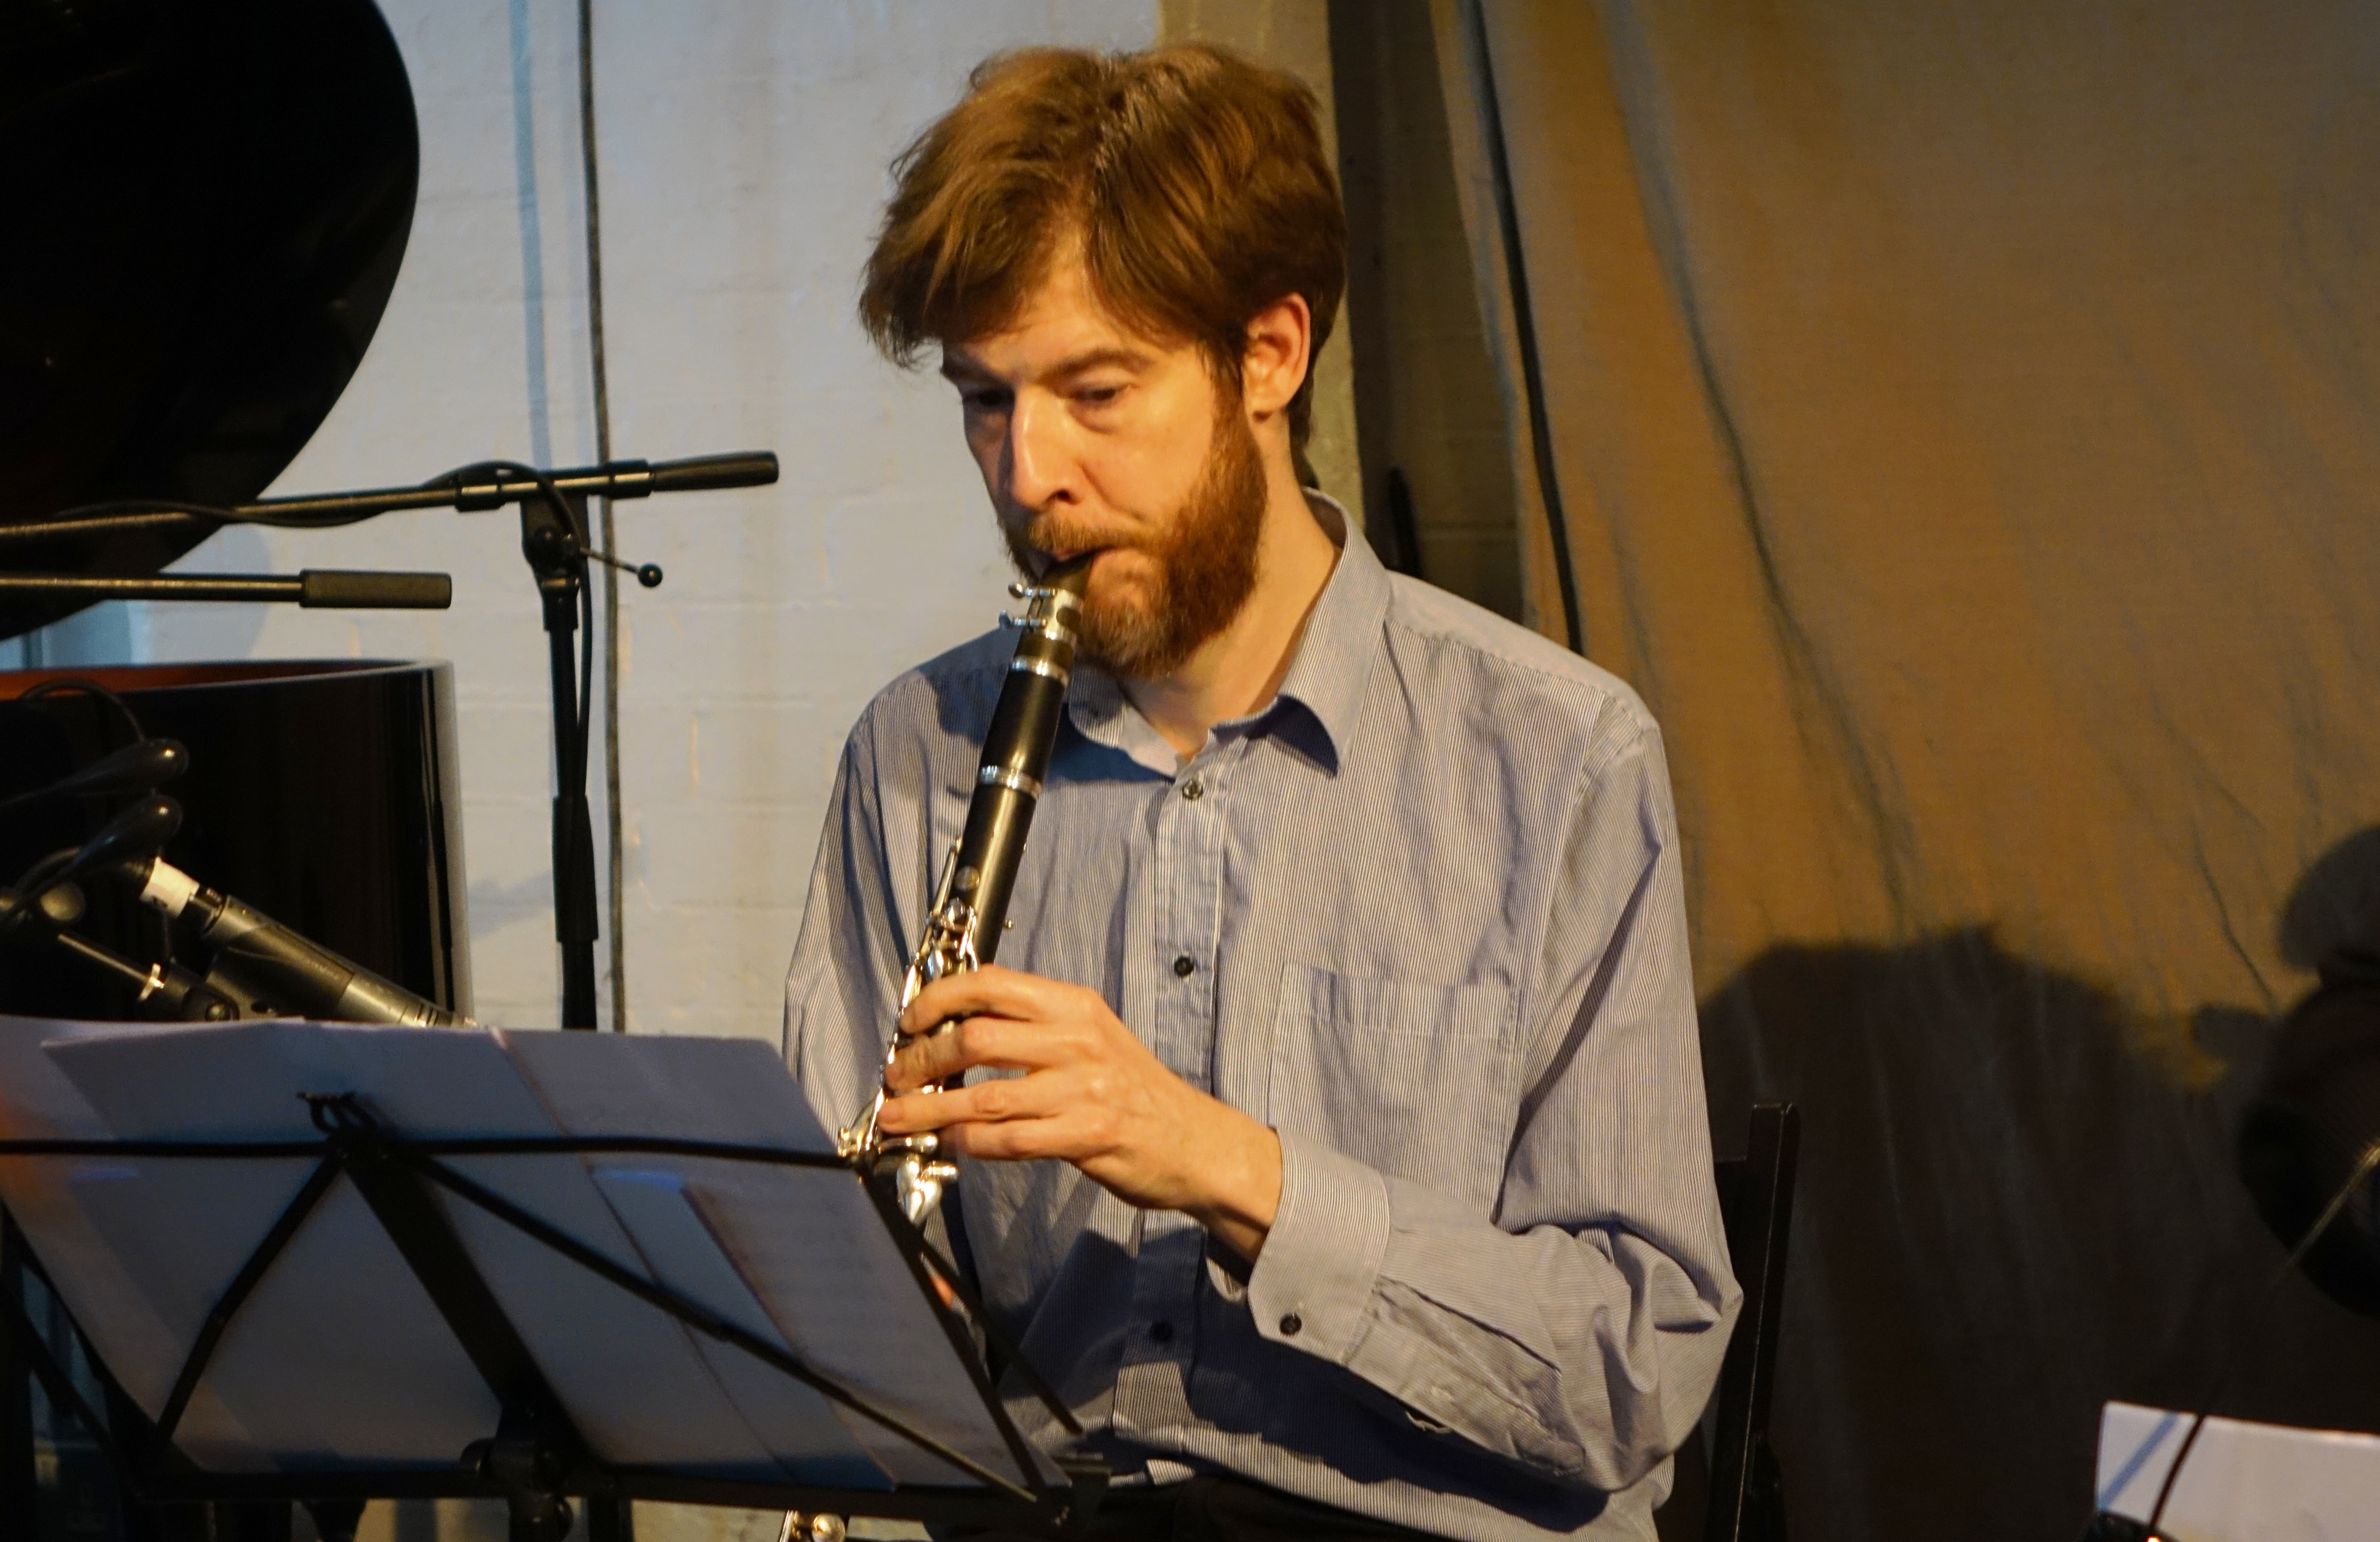 Alex Ward at Cafe Oto, London in April 2018